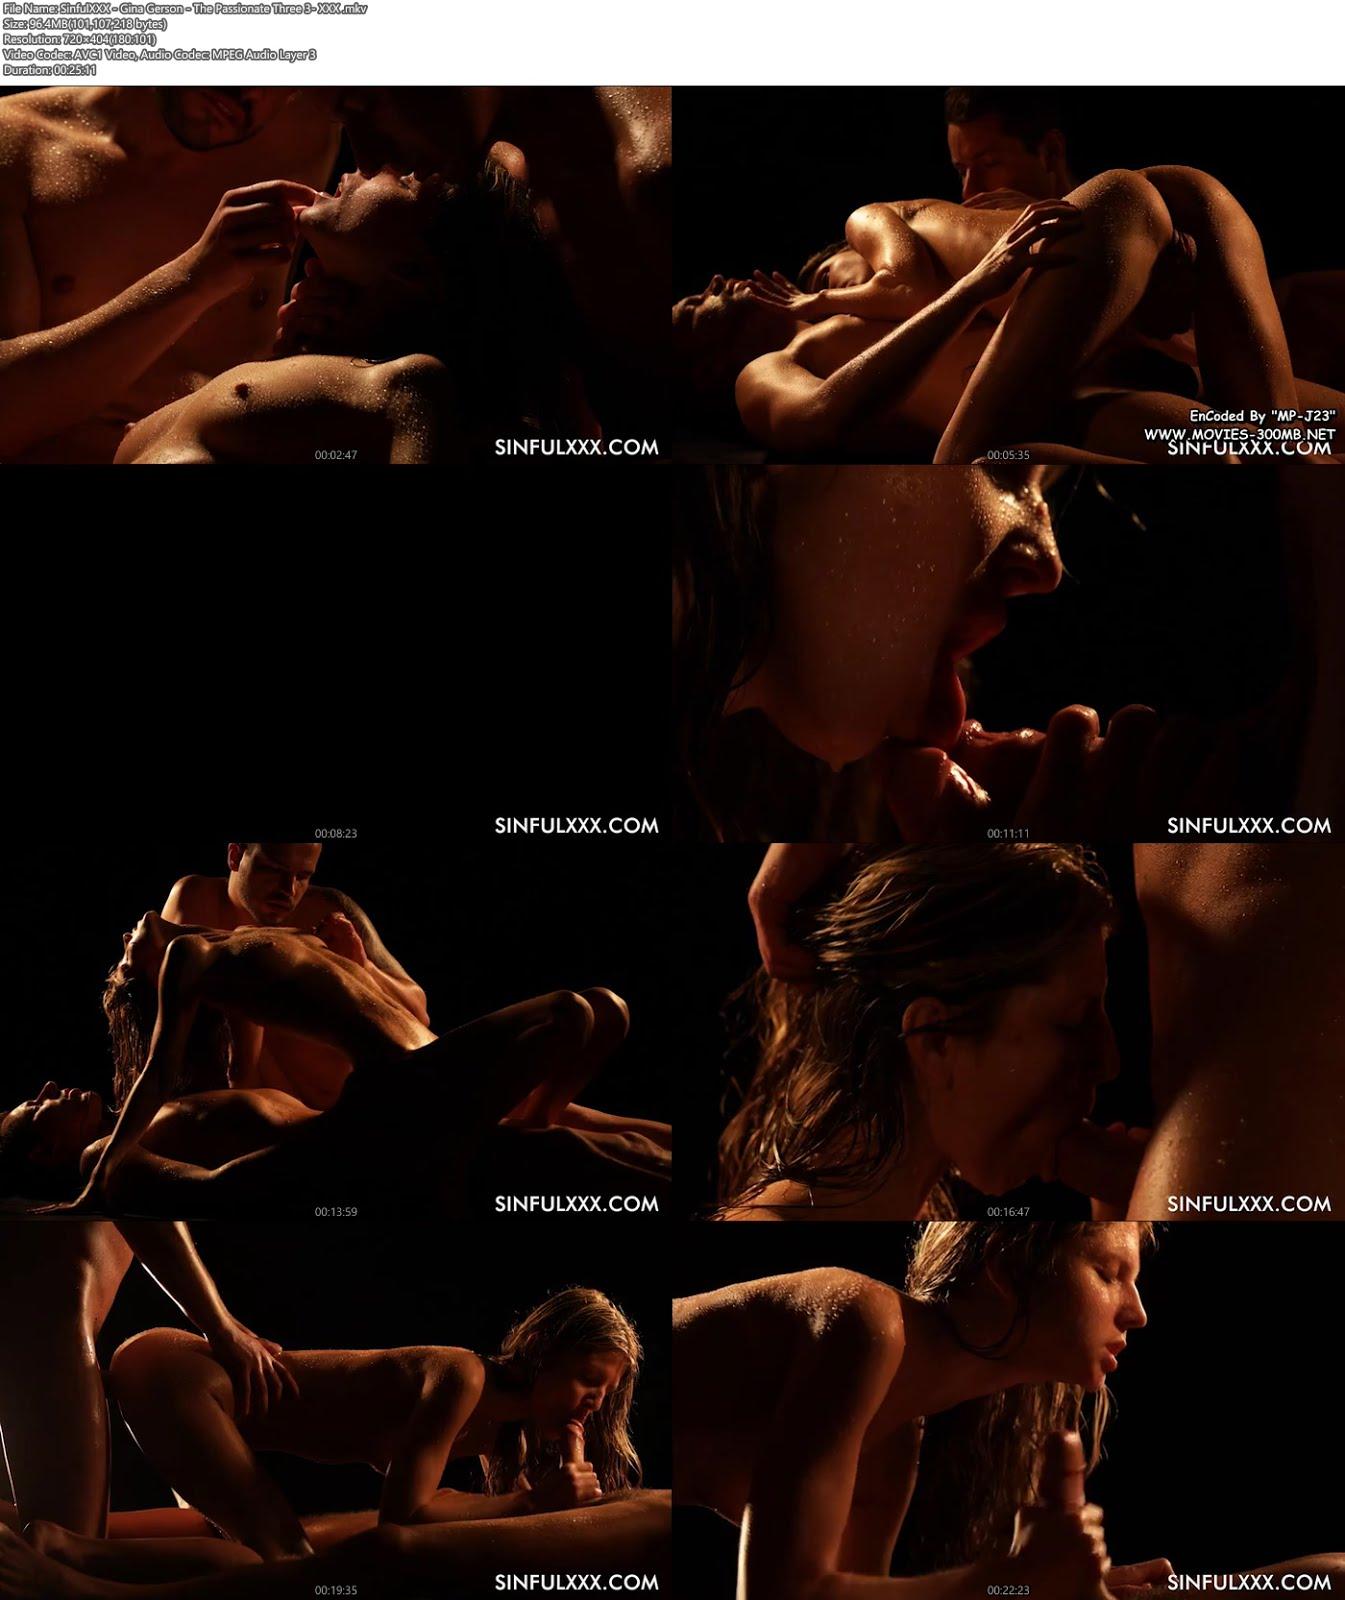 [18+] SinfulXXX - Gina Gerson - The Passionate Three 3- XXXMovies 2017 100MB Porn Videos Screenshot